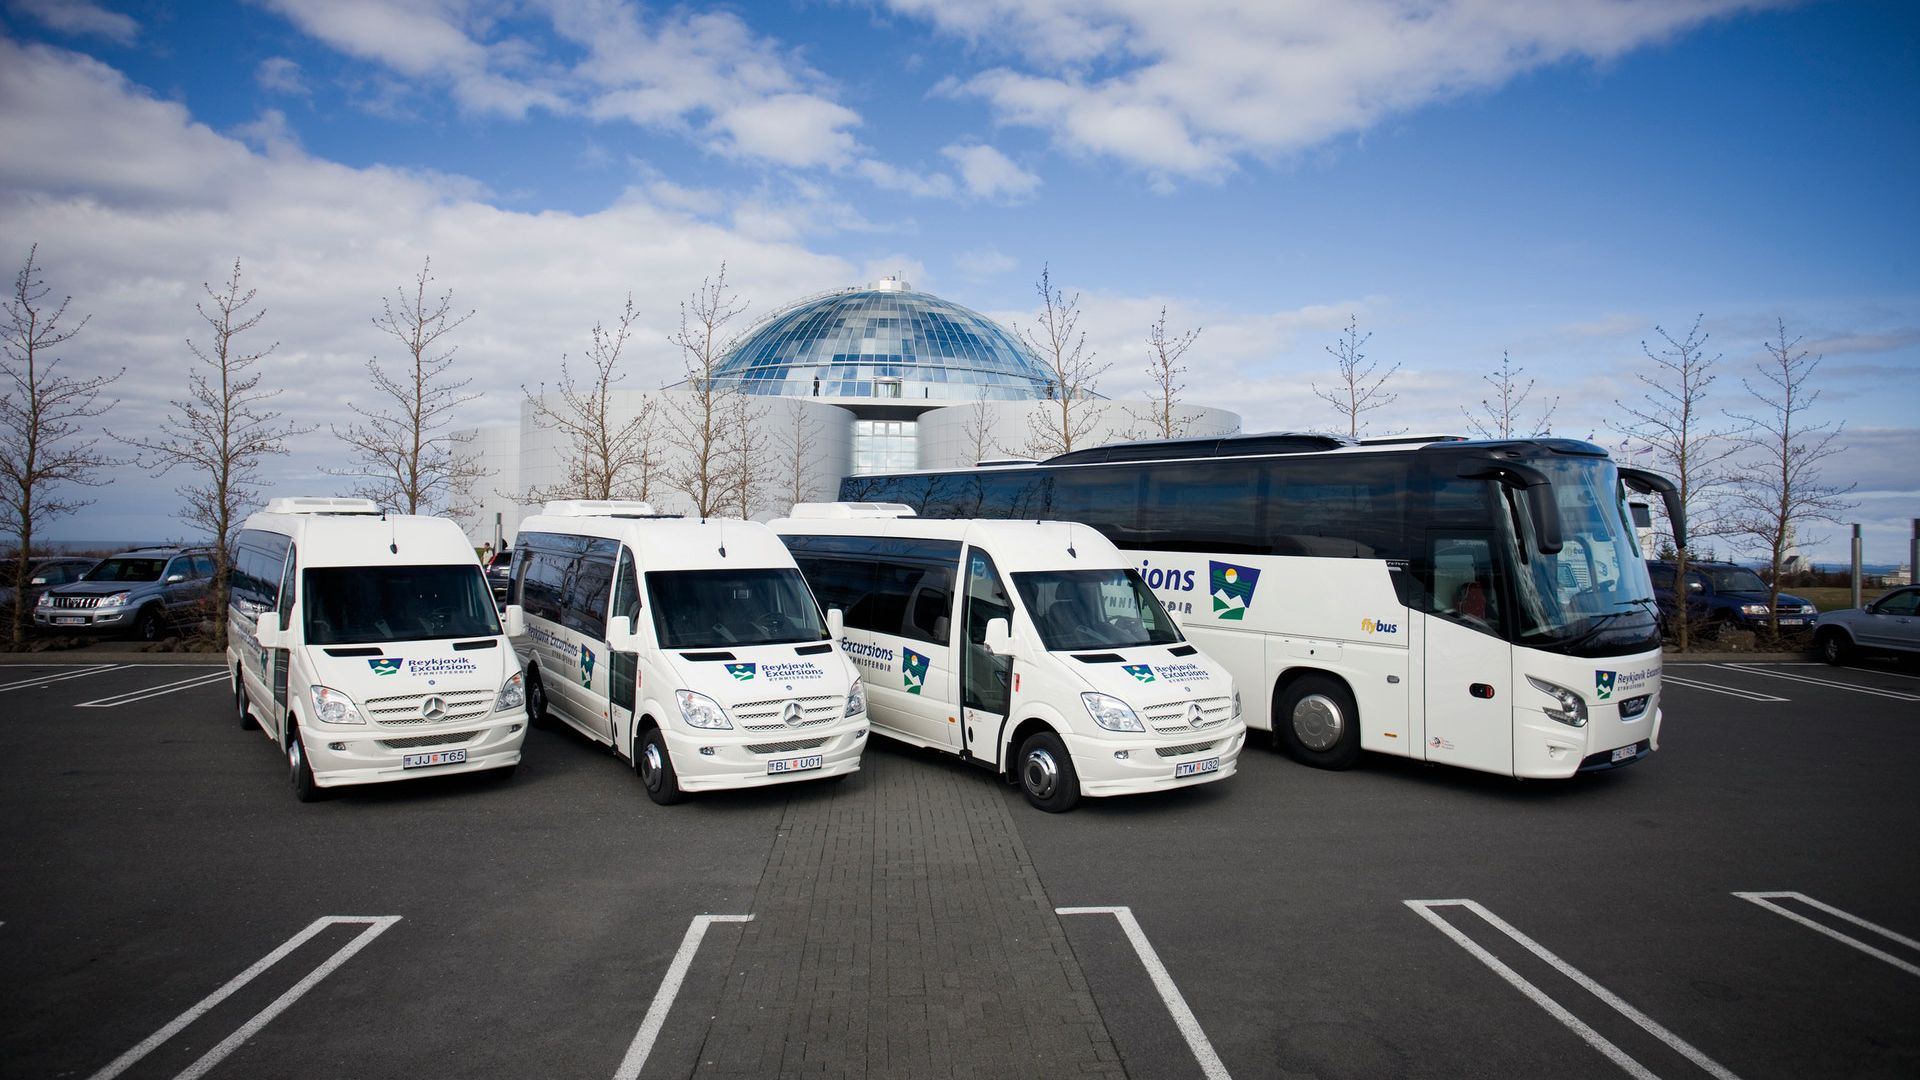 Keflavik-Reykjavik Airport Transfer: Return